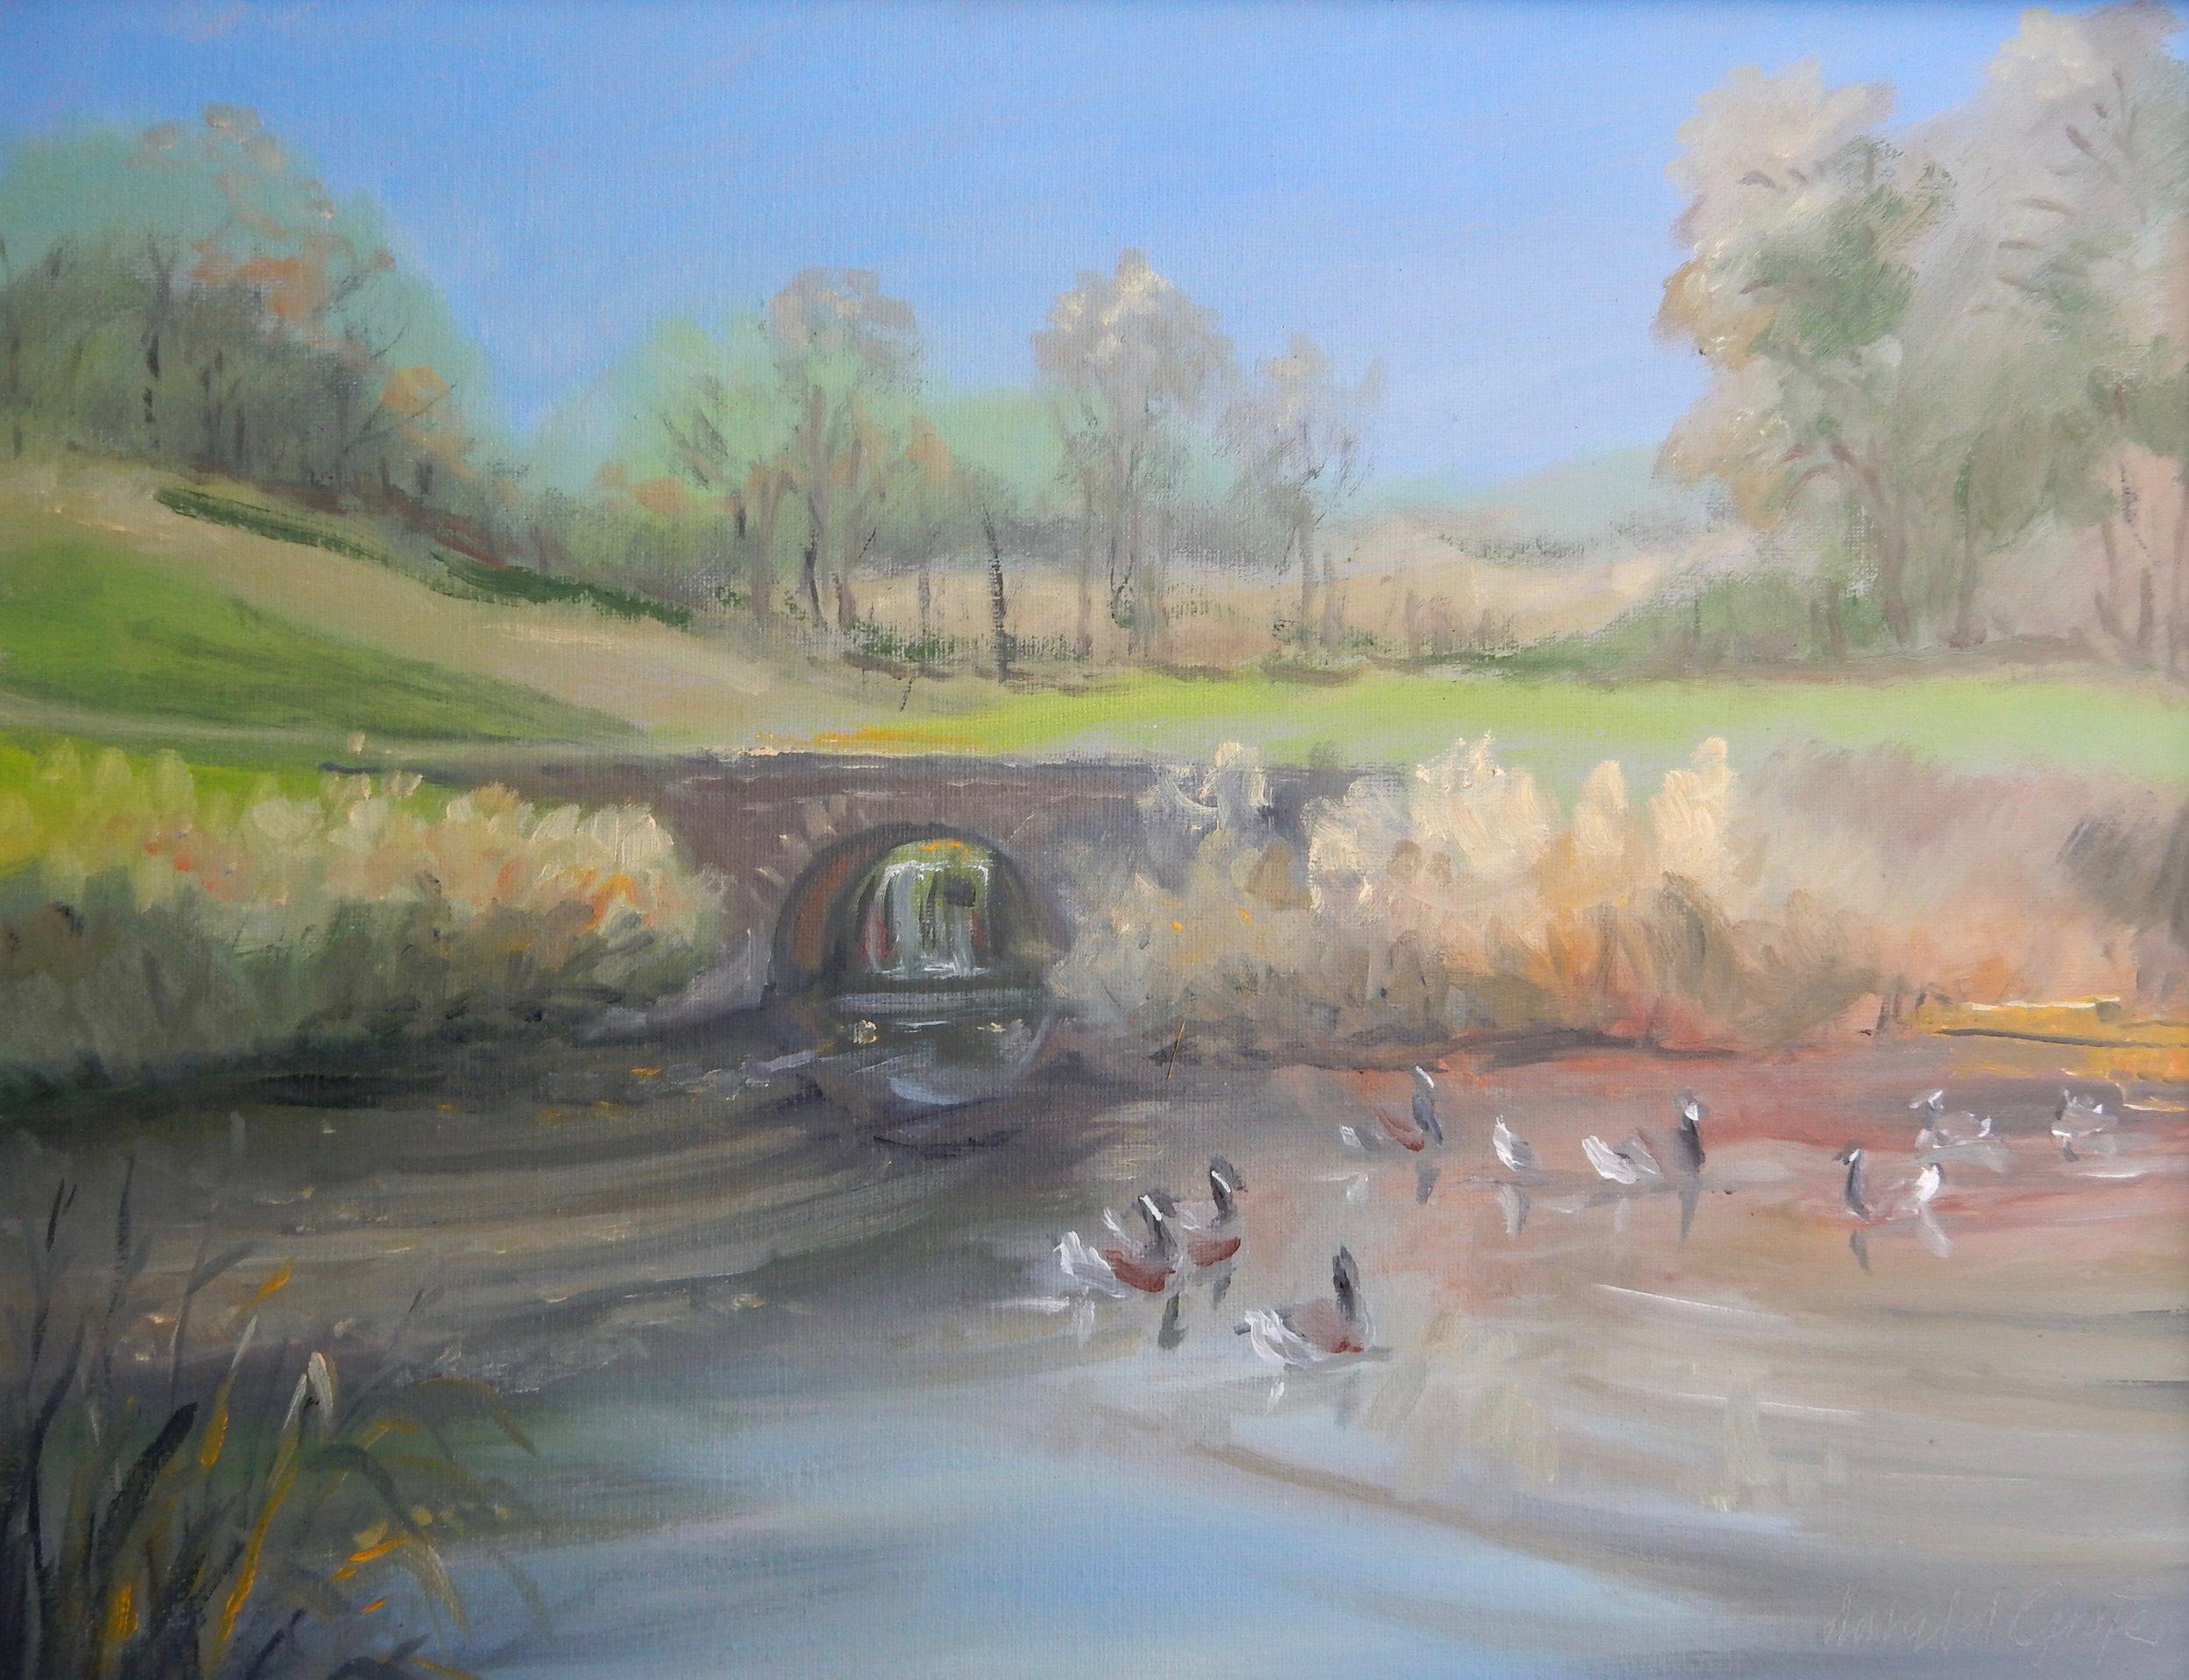 Grote DSCN6592 18x24 Duck Pond - Winterthur.jpg